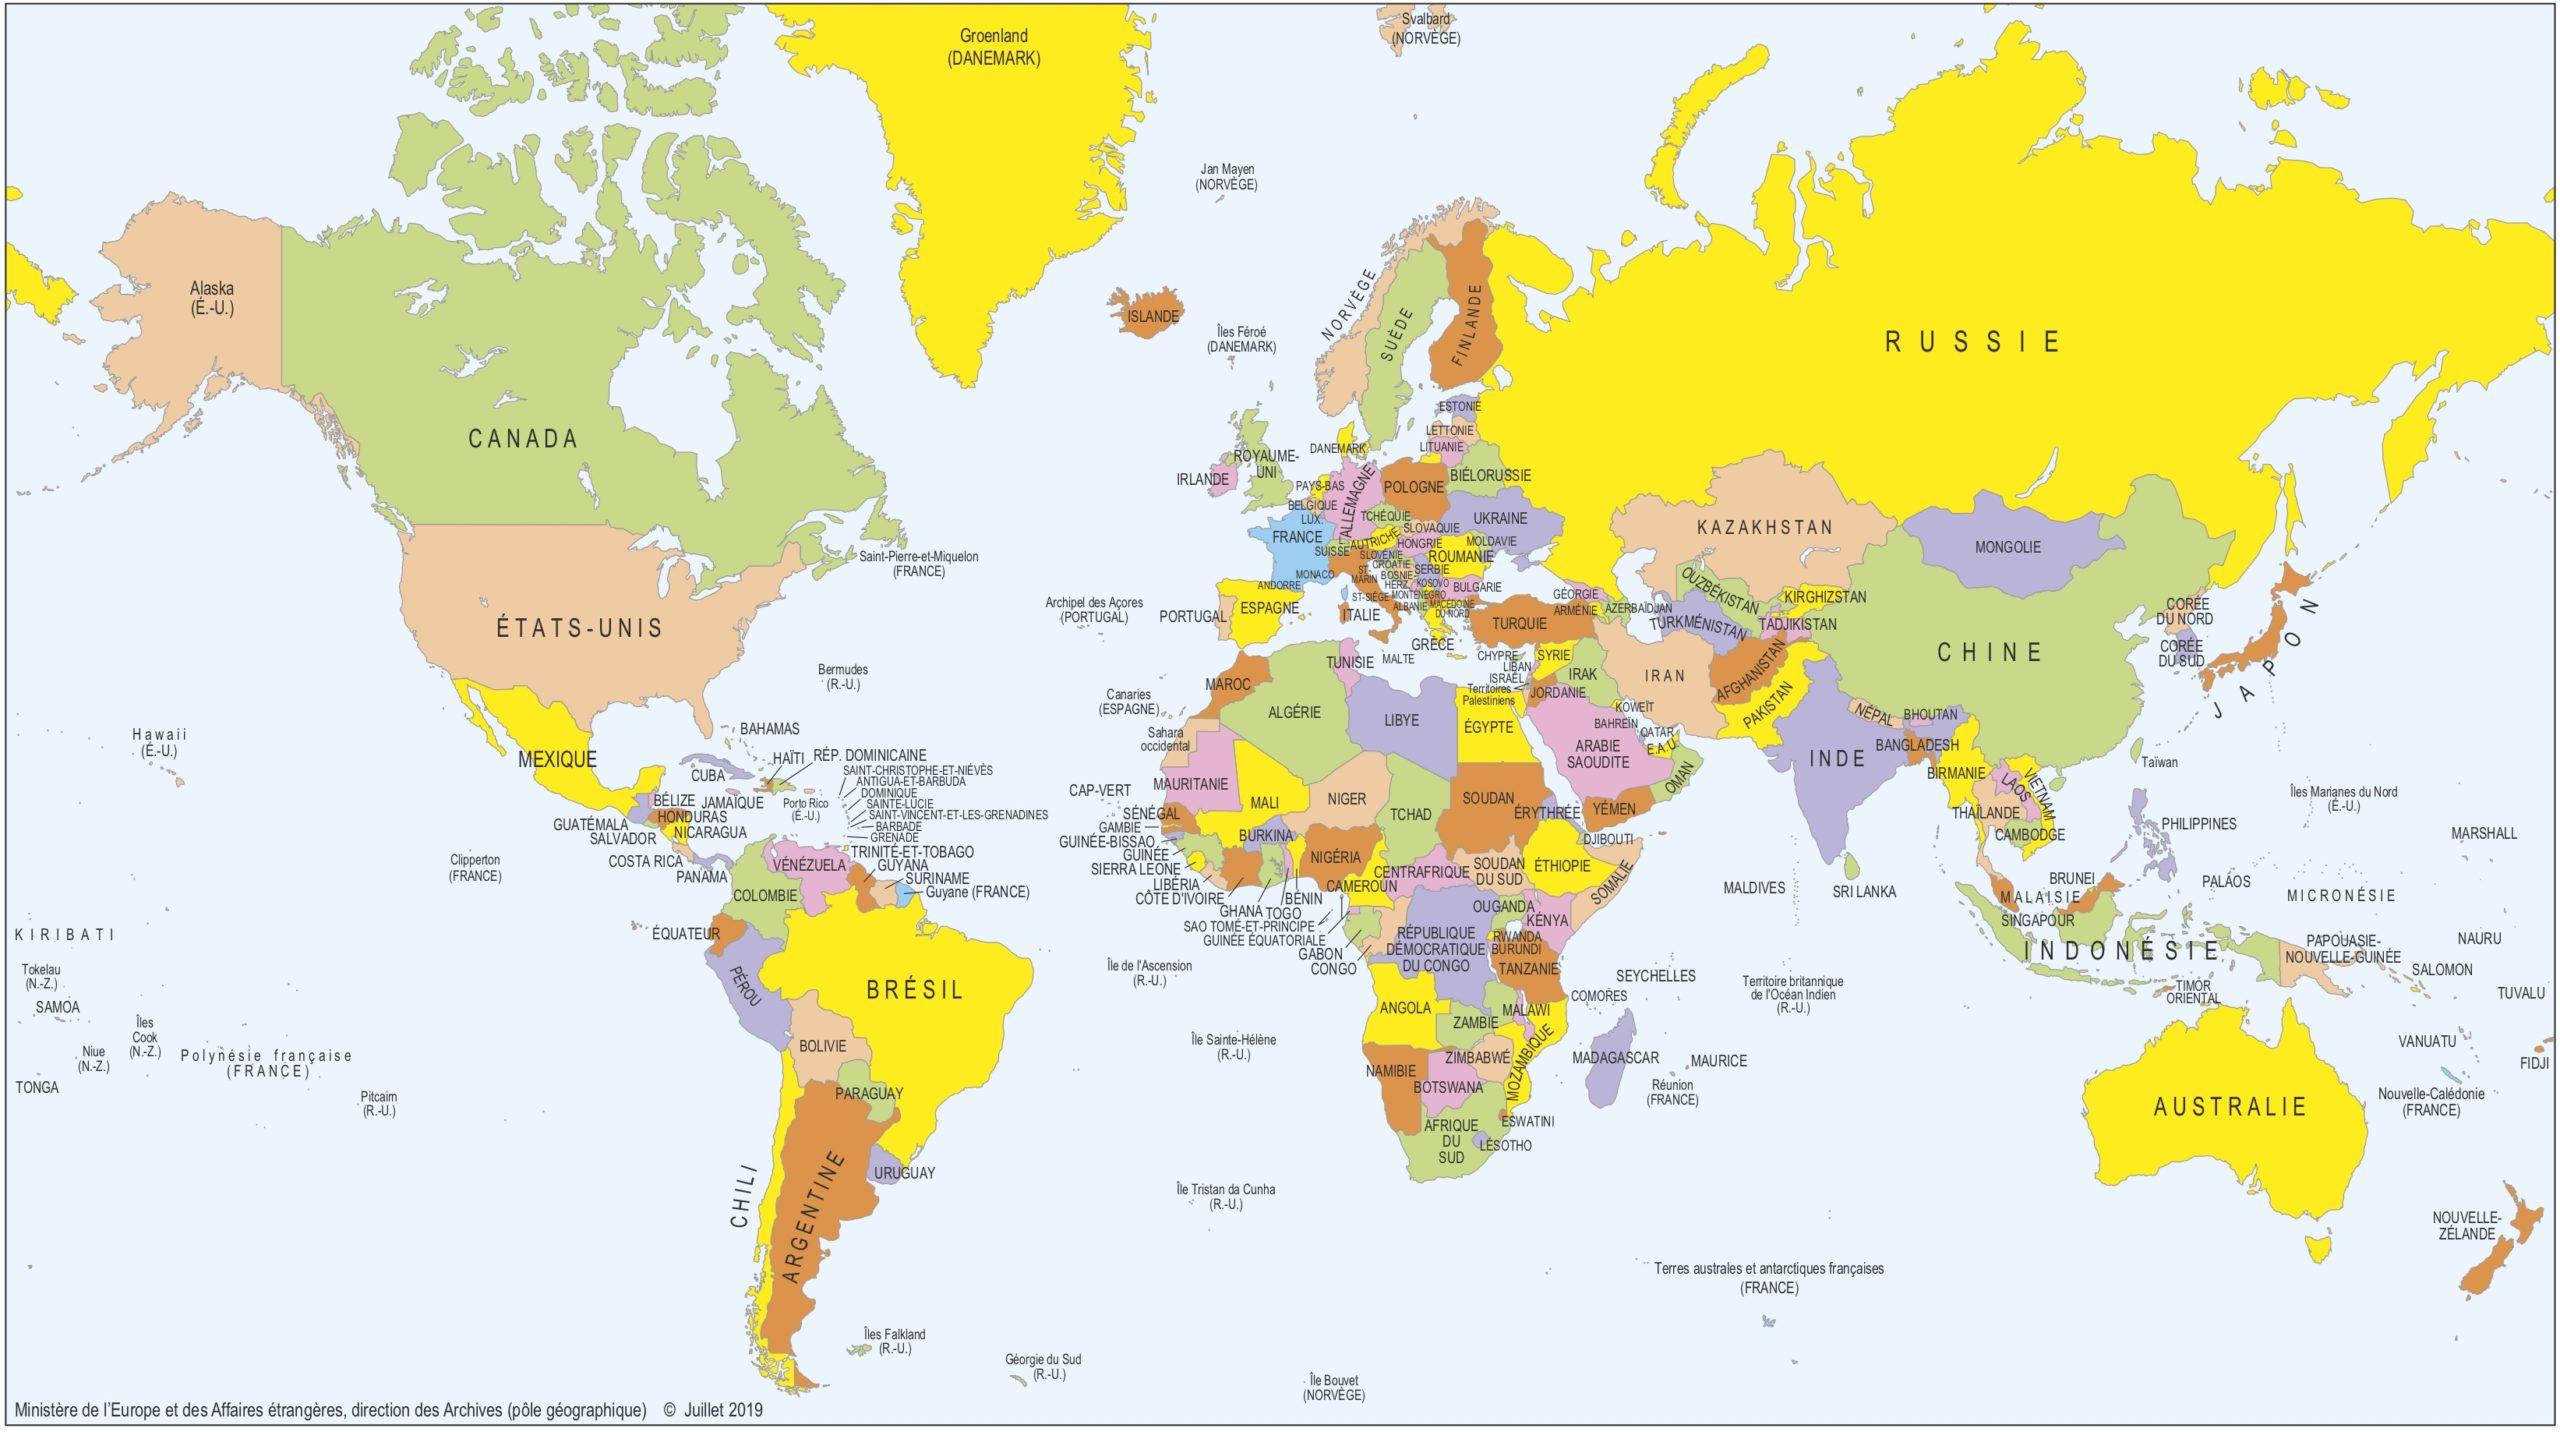 Monde - Politique (Grand) • Carte • Populationdata dedans Carte Du Monde En Ligne